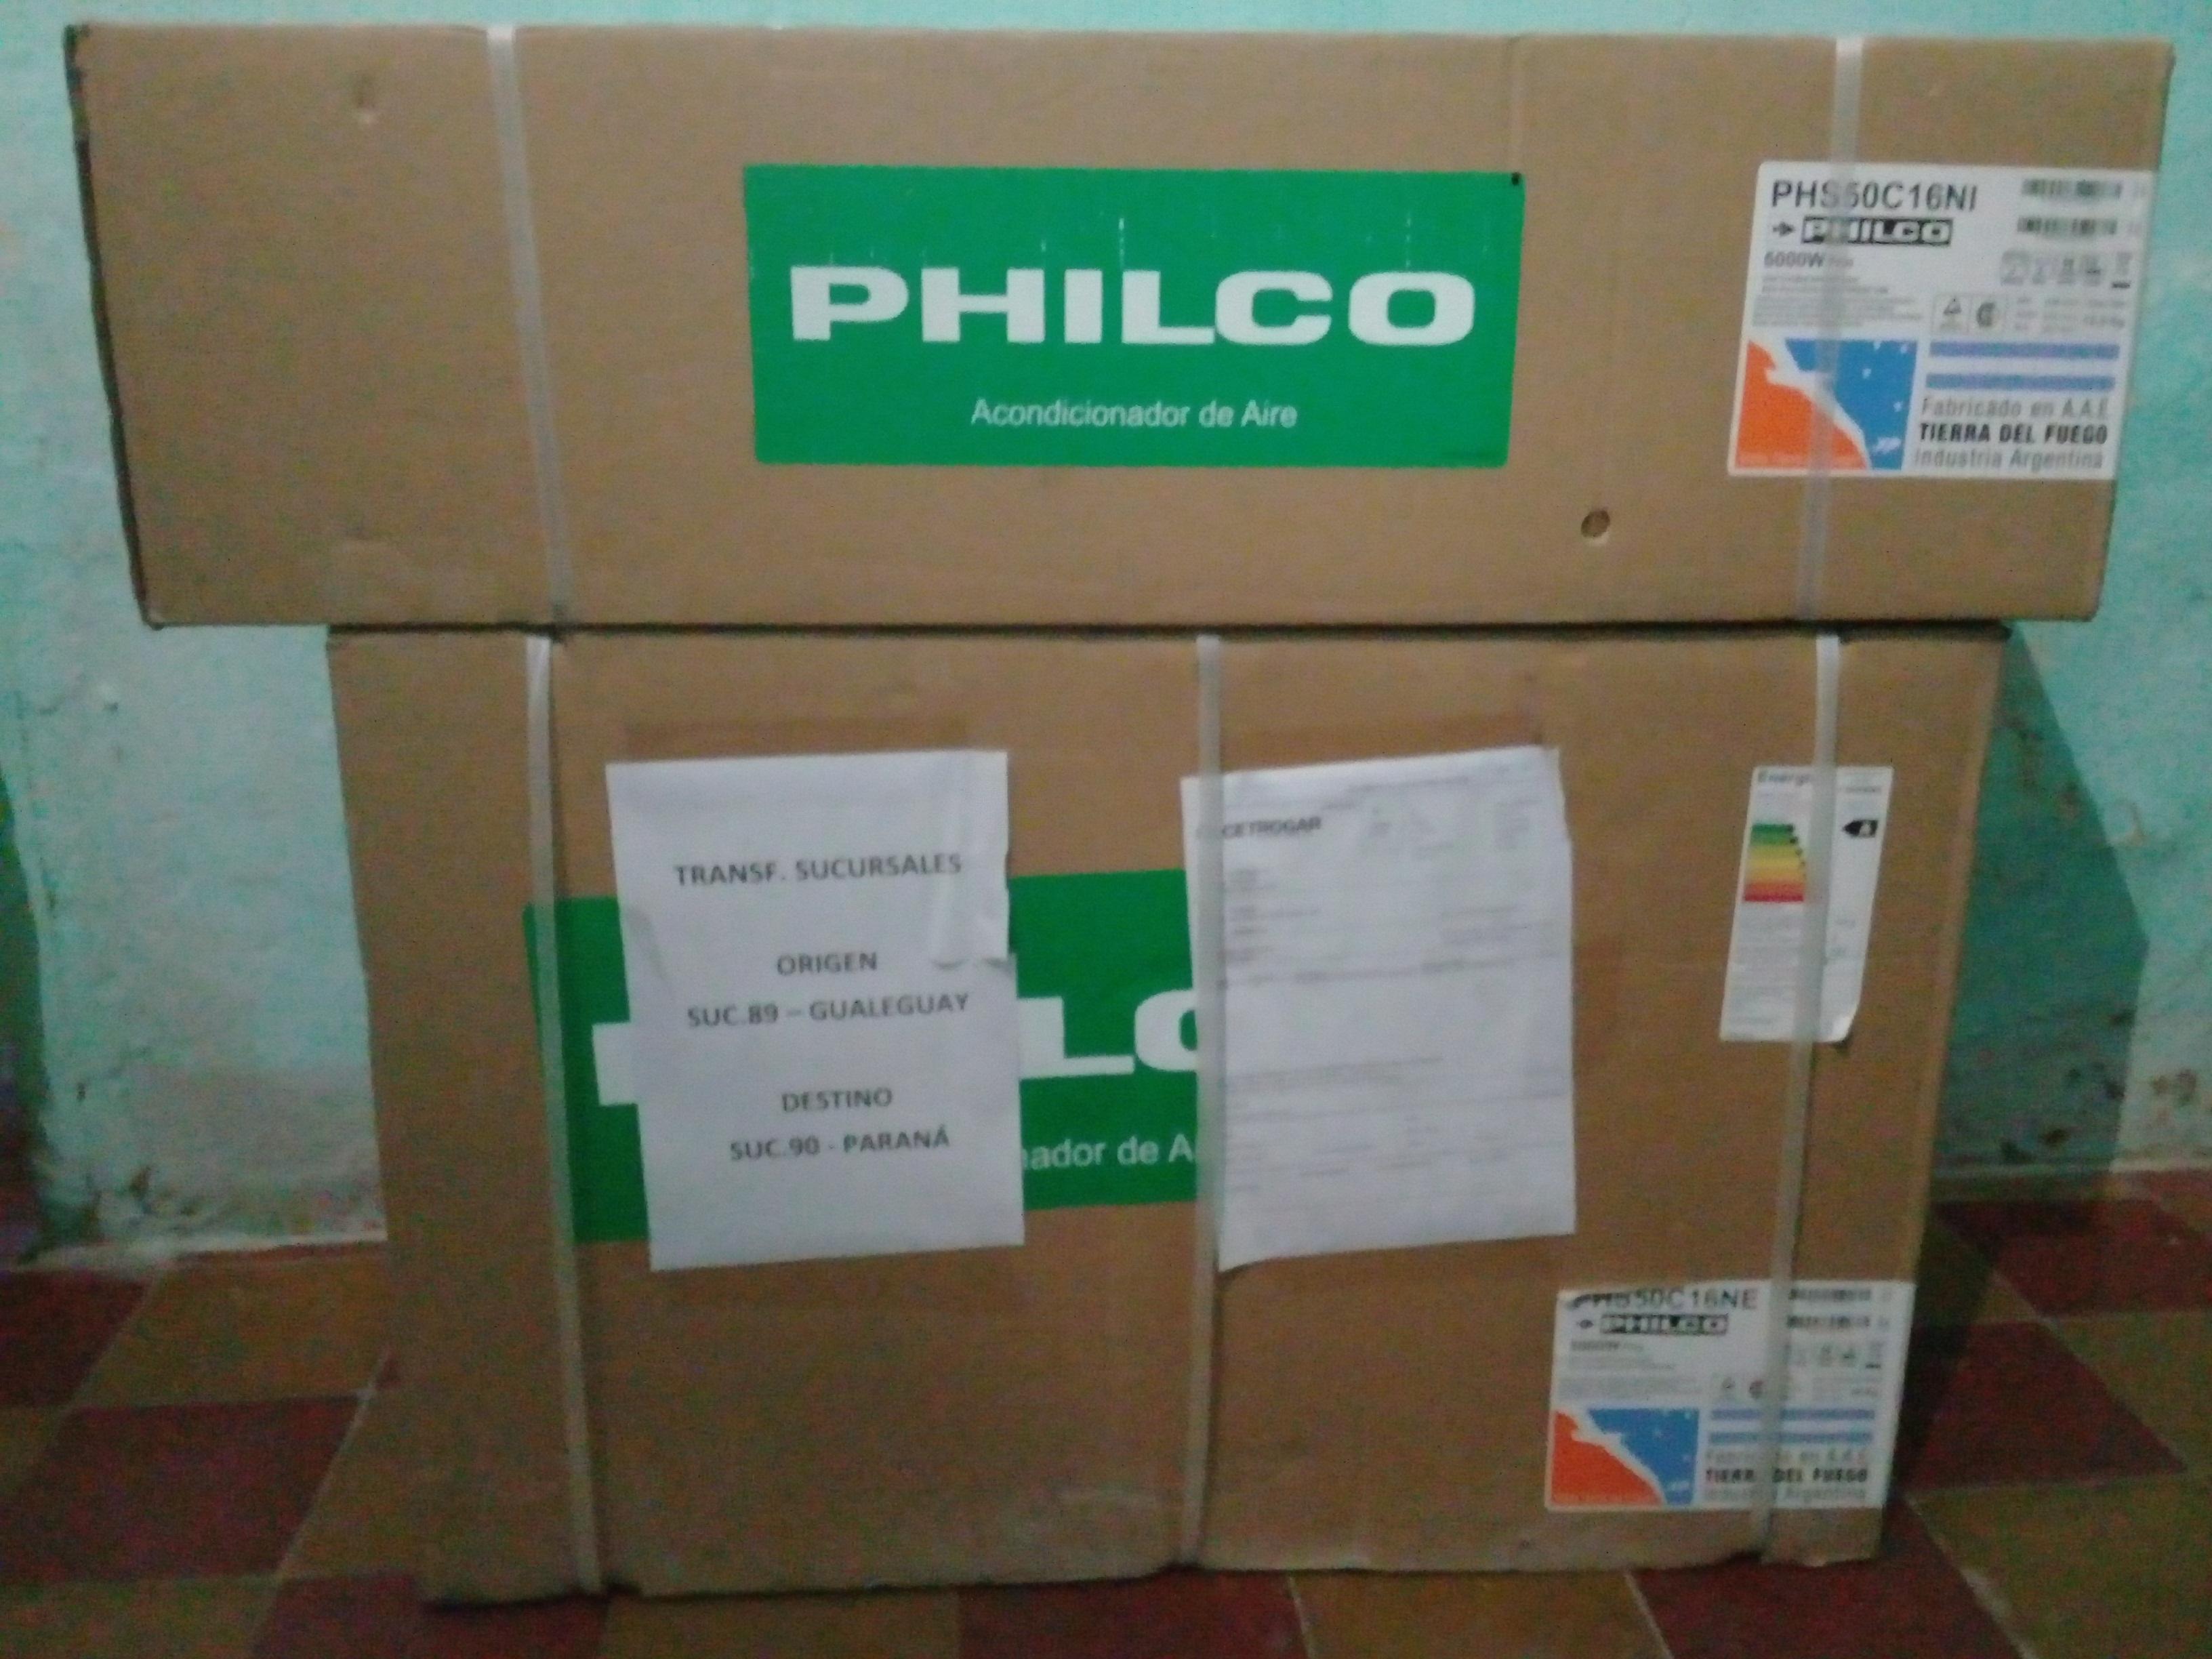 VENDO SPLIT PHILCO 5000W 4300FG SIN USO. ENTREGA Y CUOTAS.